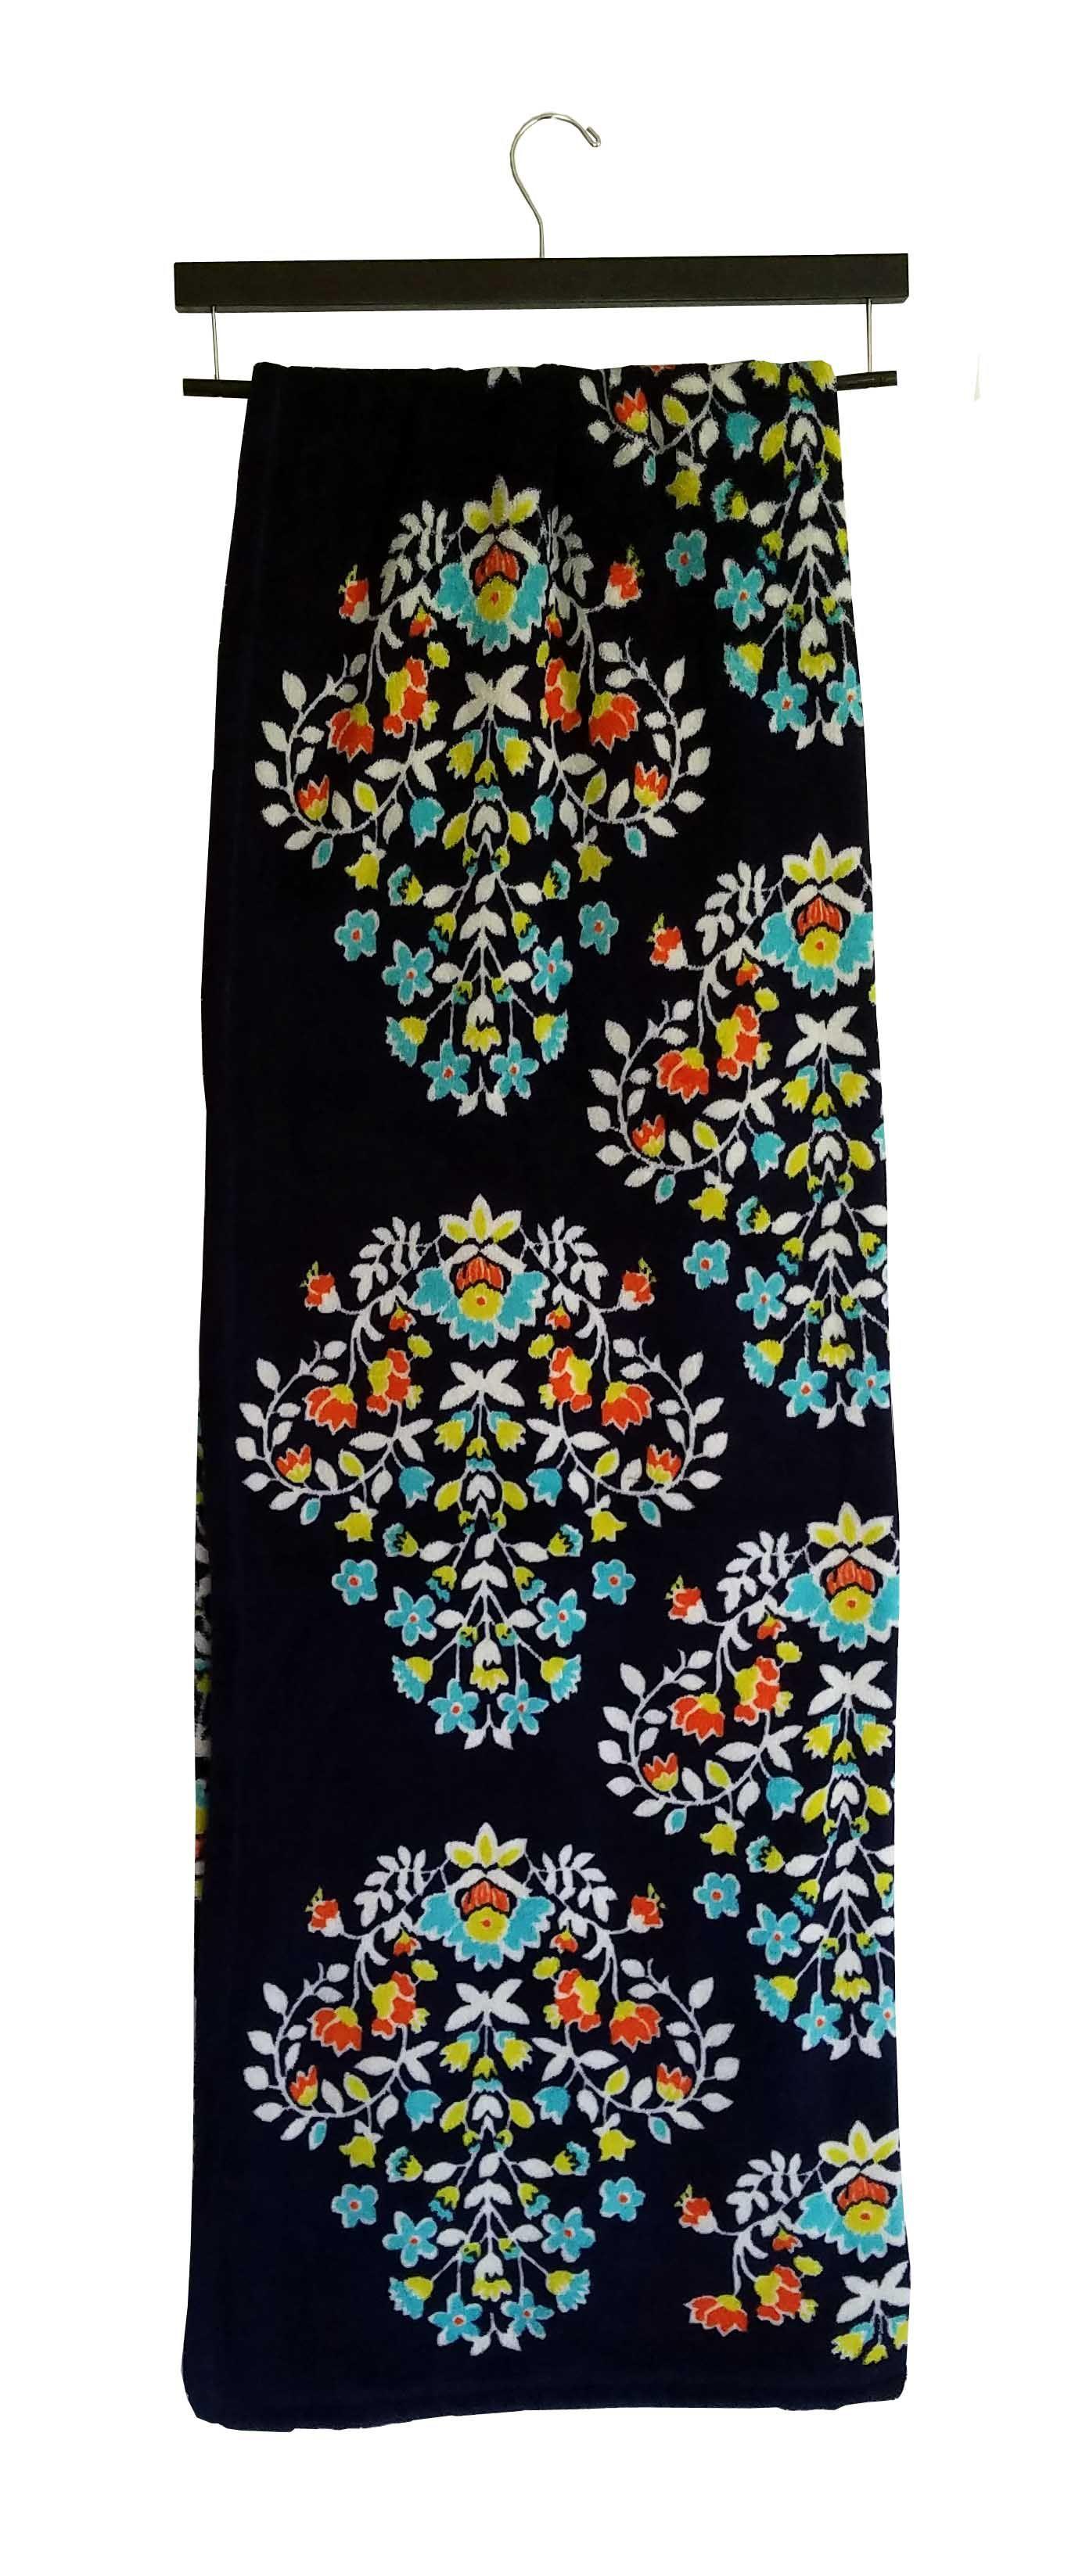 Vera Bradley Throw Blanket in Chandelier Floral